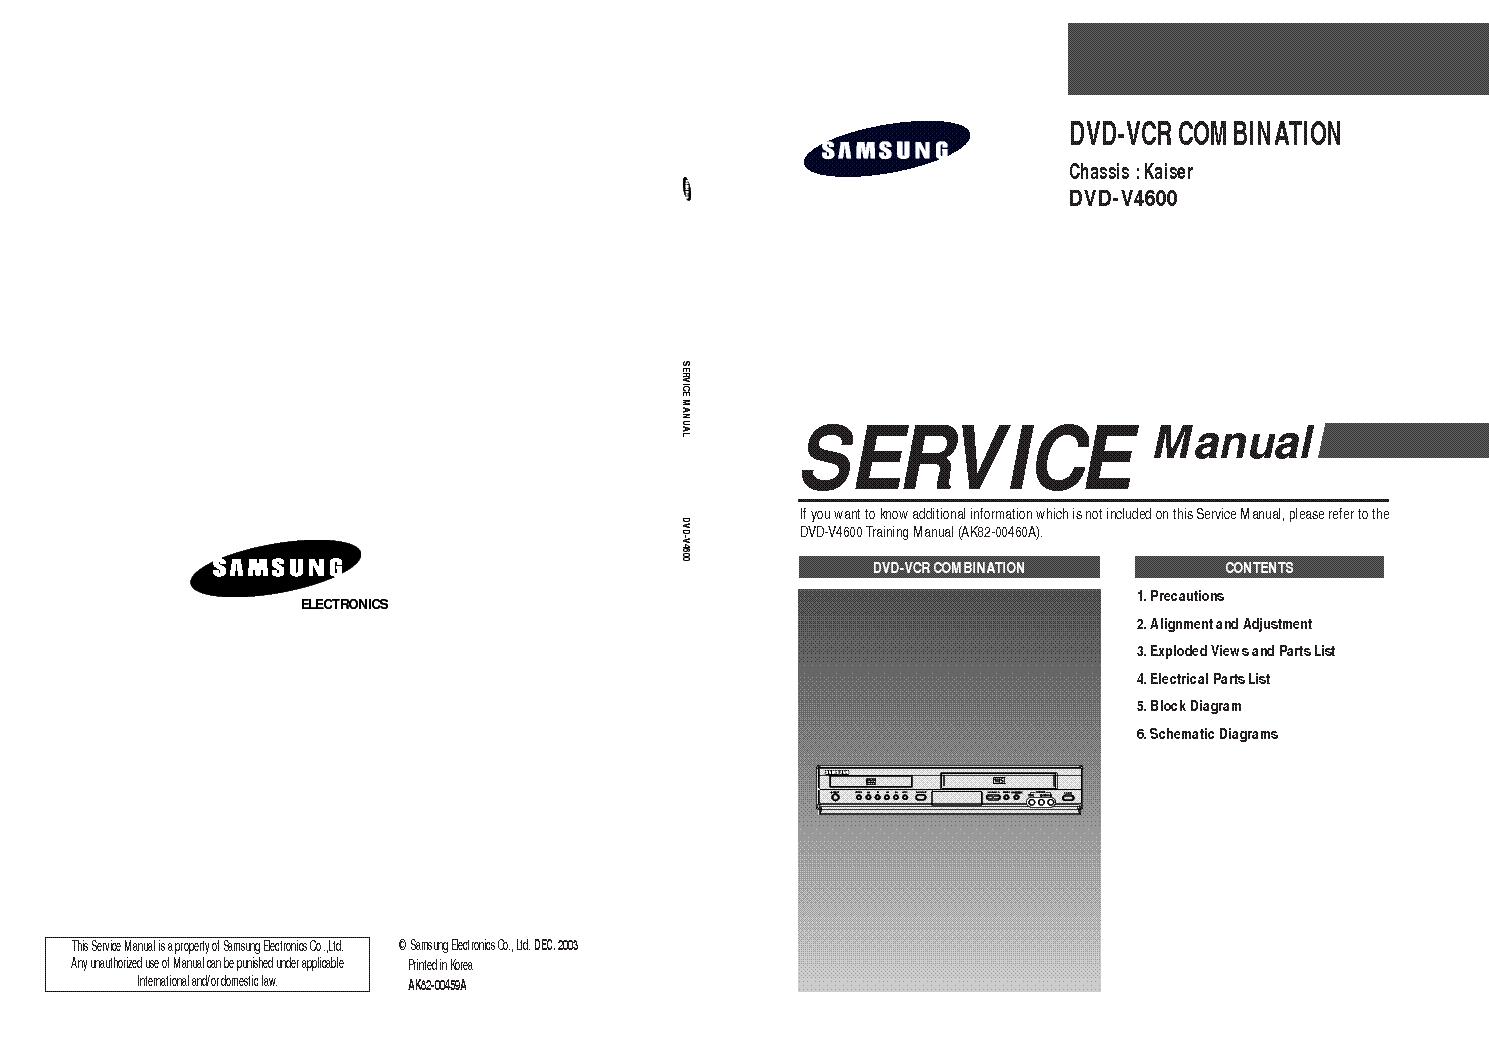 samsung dvd v4600 service manual download schematics eeprom rh elektrotanya com Verizon Samsung Flip Phone Manual Verizon Samsung Flip Phone Manual